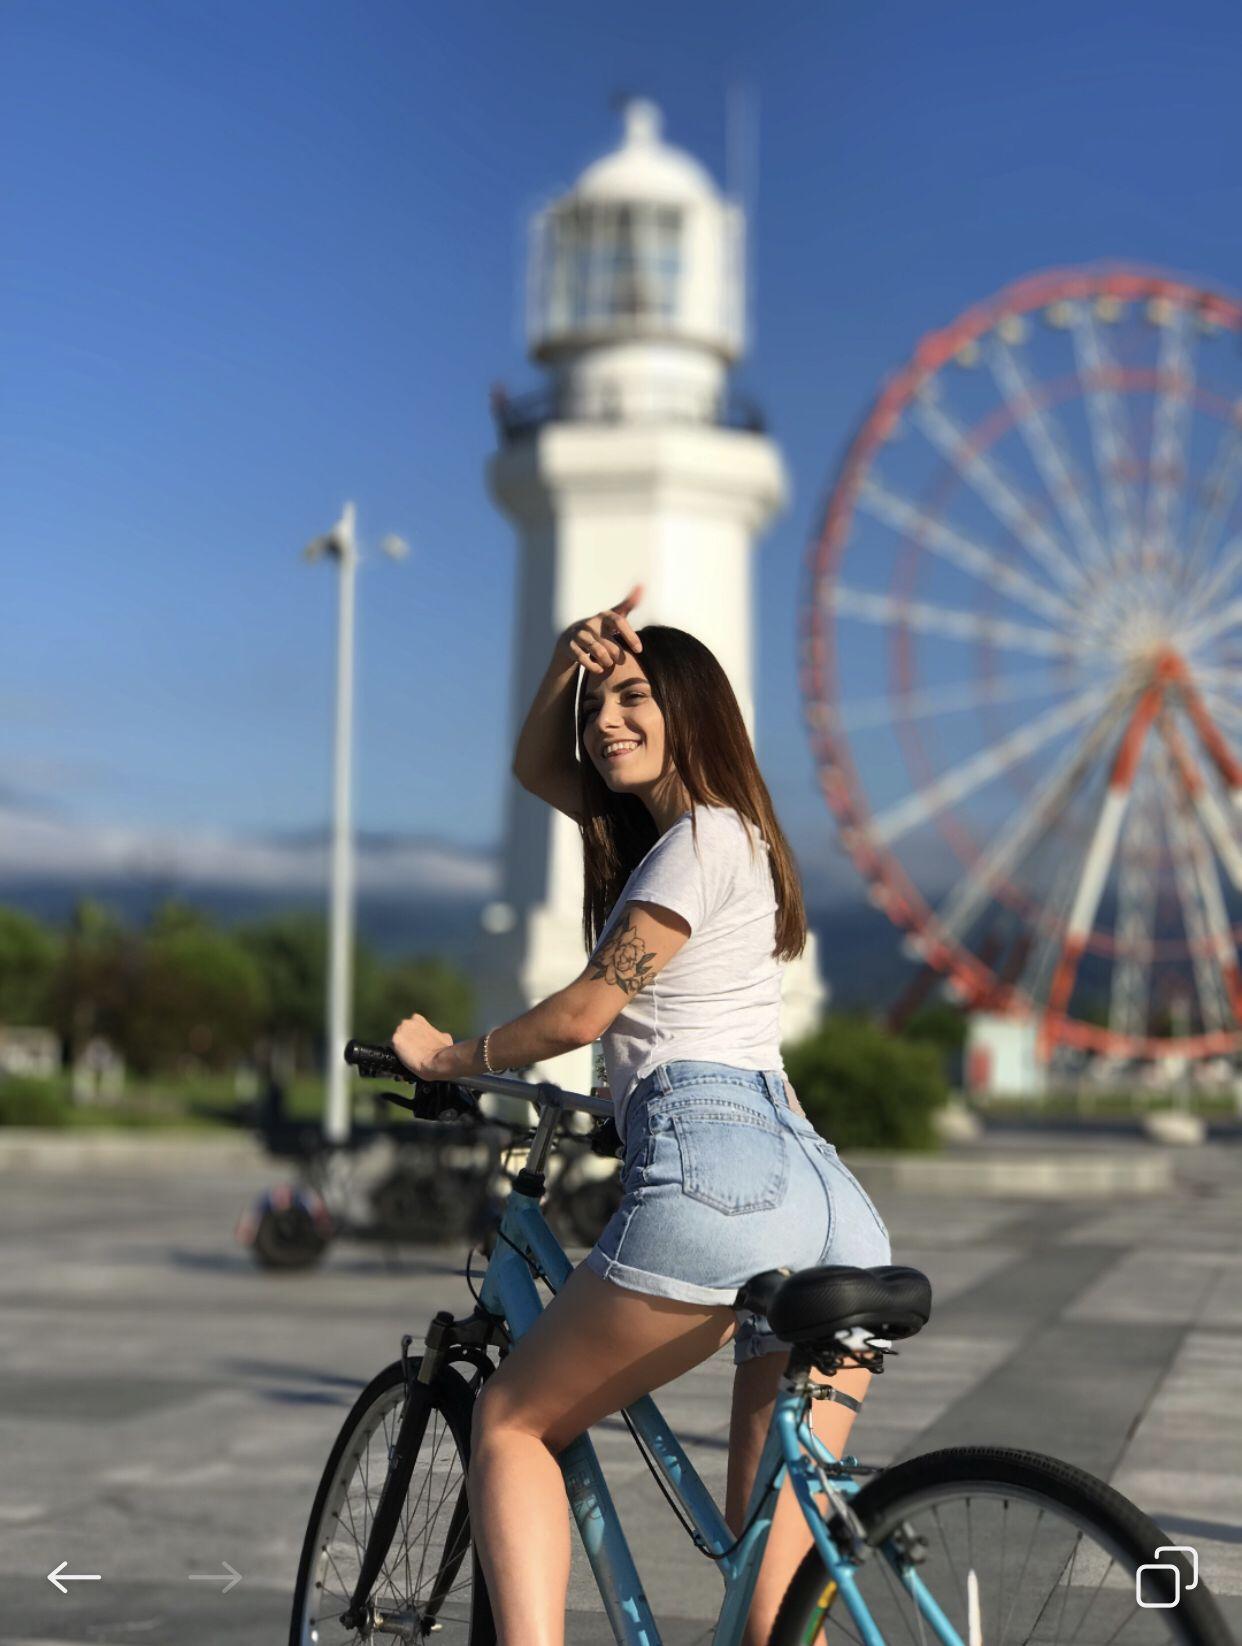 Утренние звезды на велосипеде фото